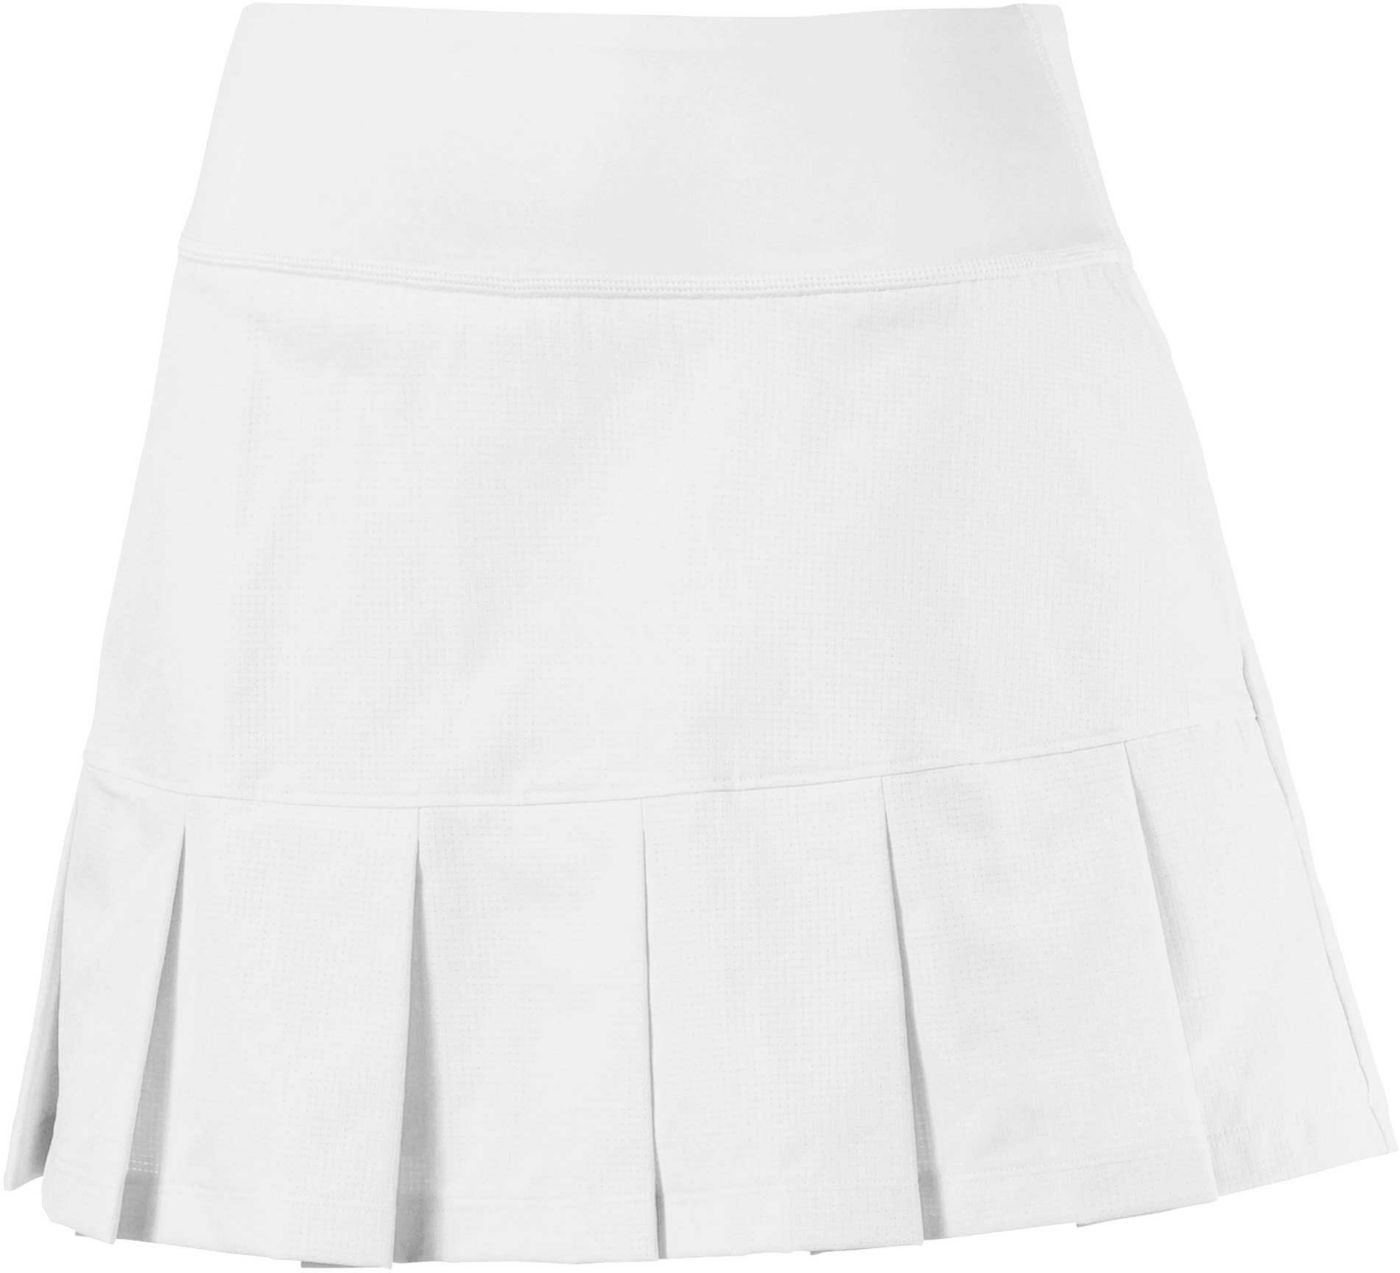 PUMA Women's PWRSHAPE On Repleat Golf Skirt